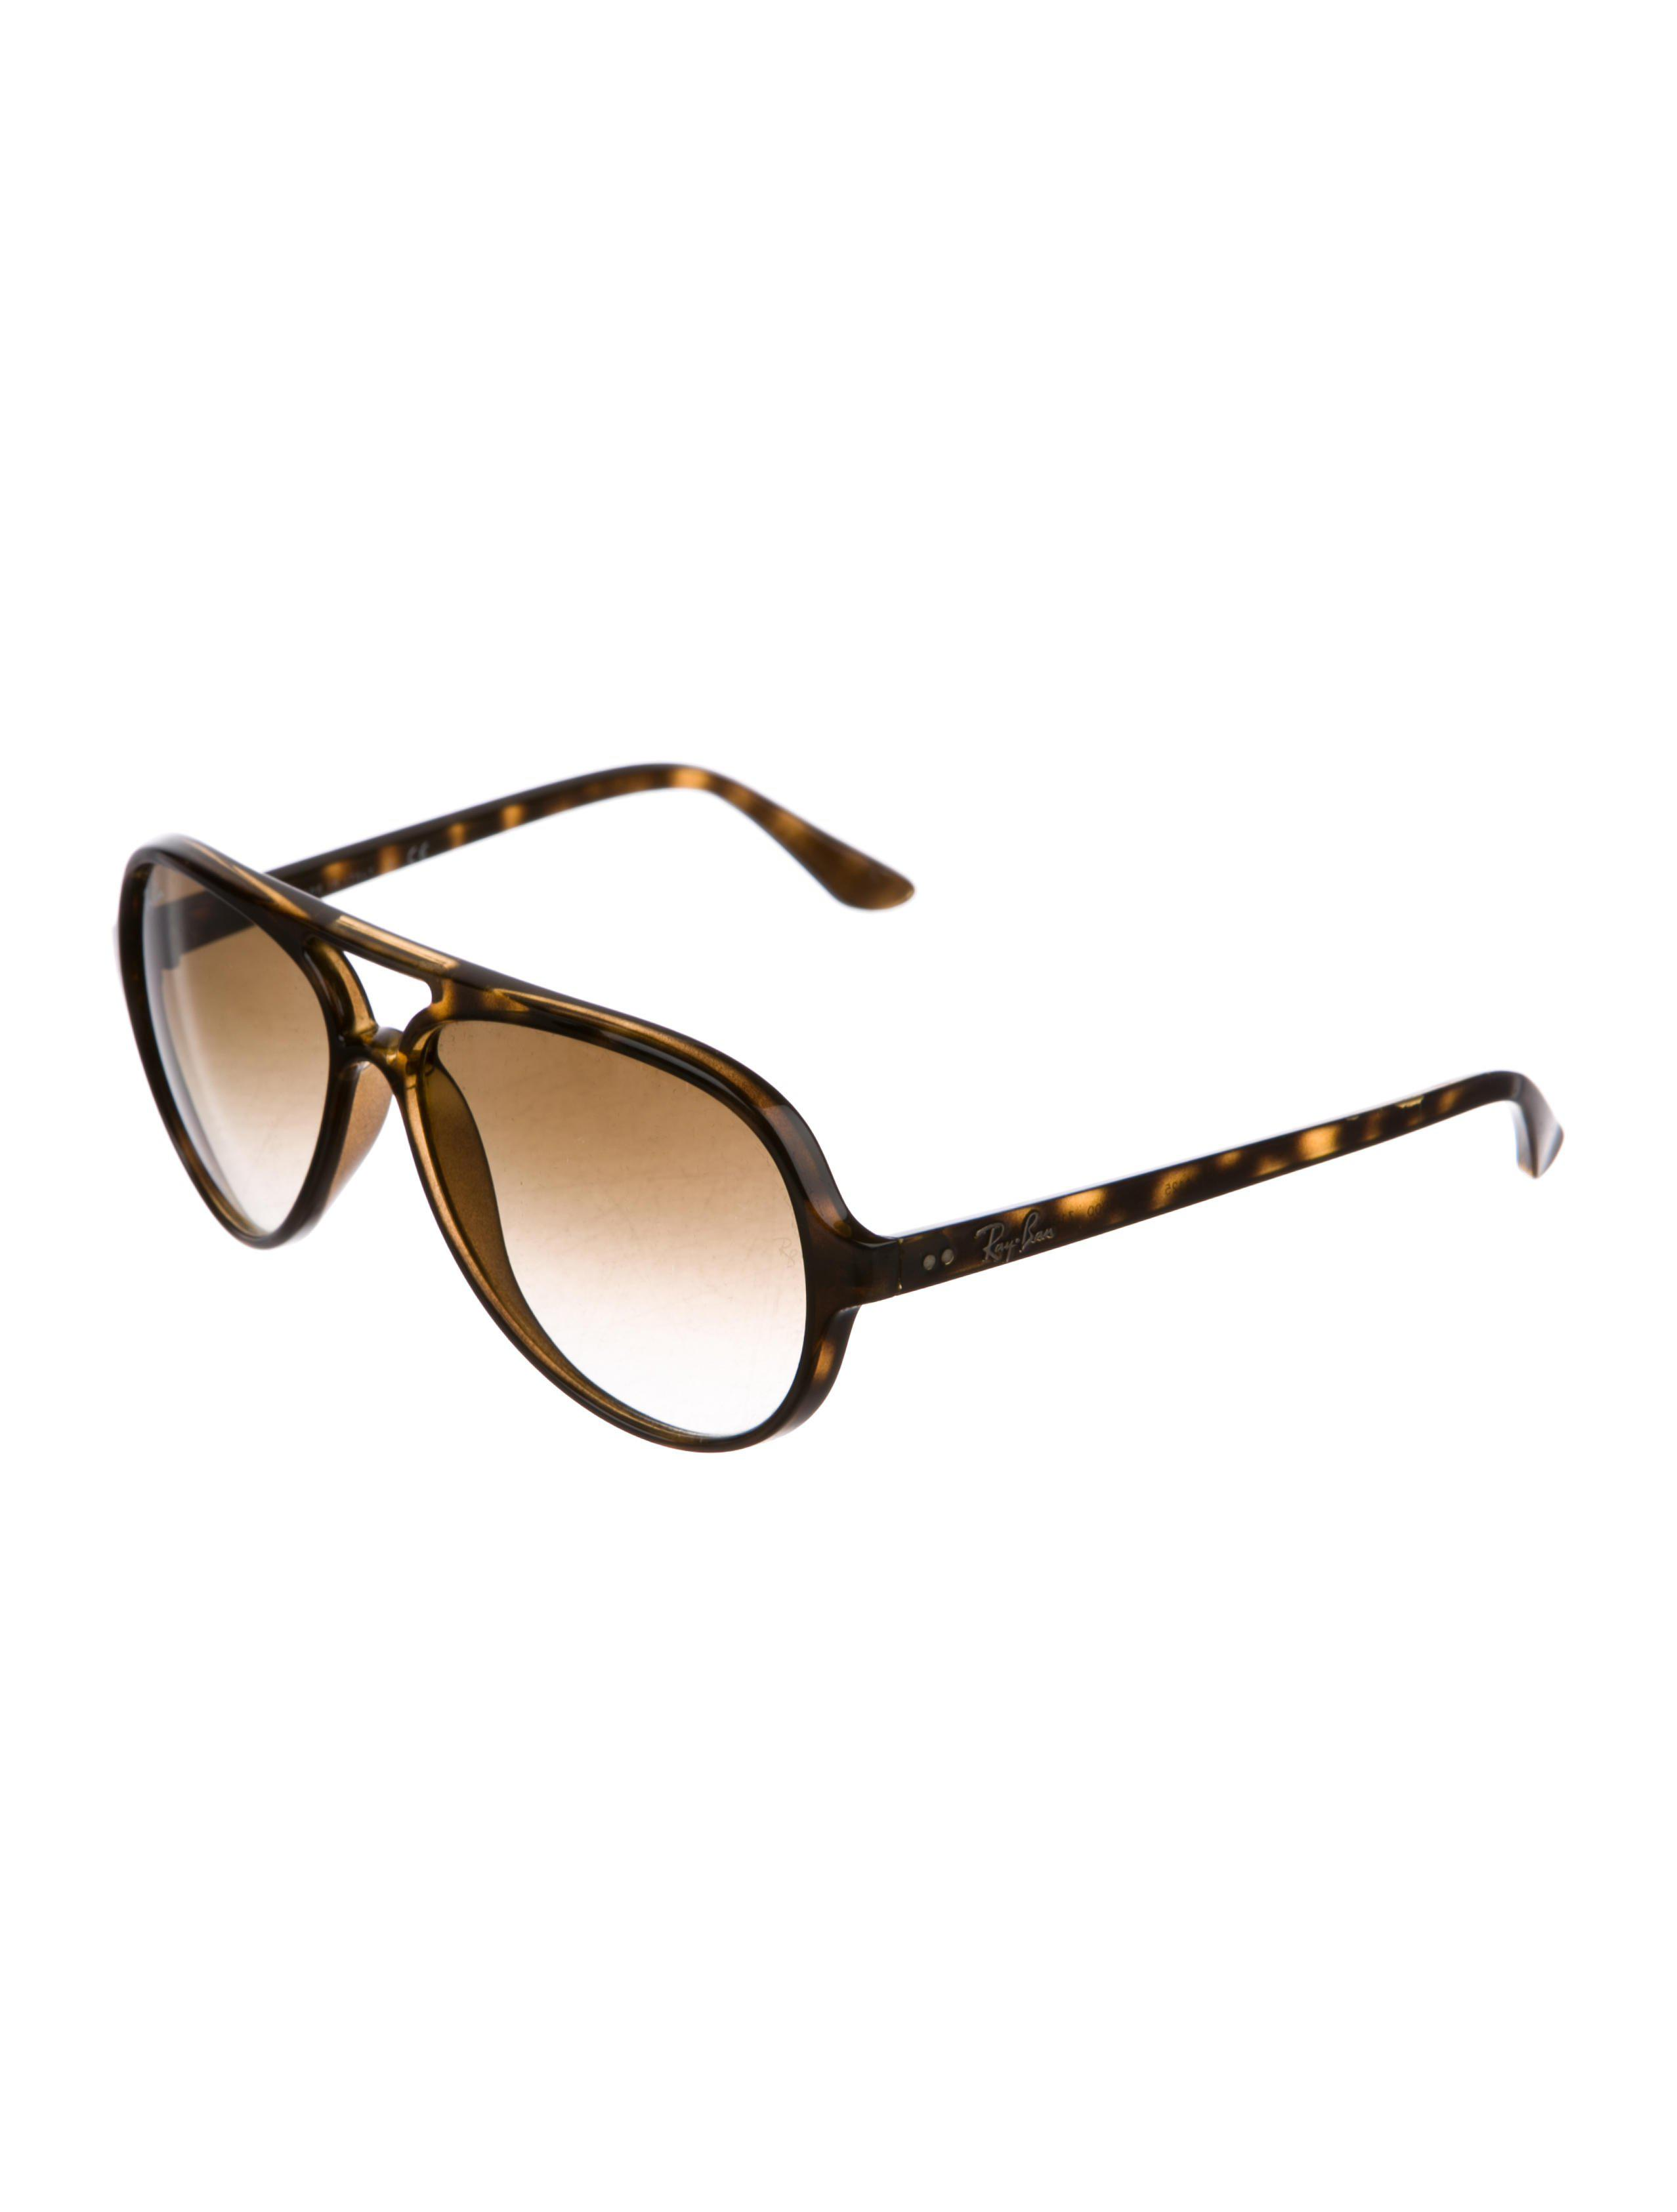 55d48b5b9253a4 free shipping ray ban light havana cats 1000 sunglasses download ...